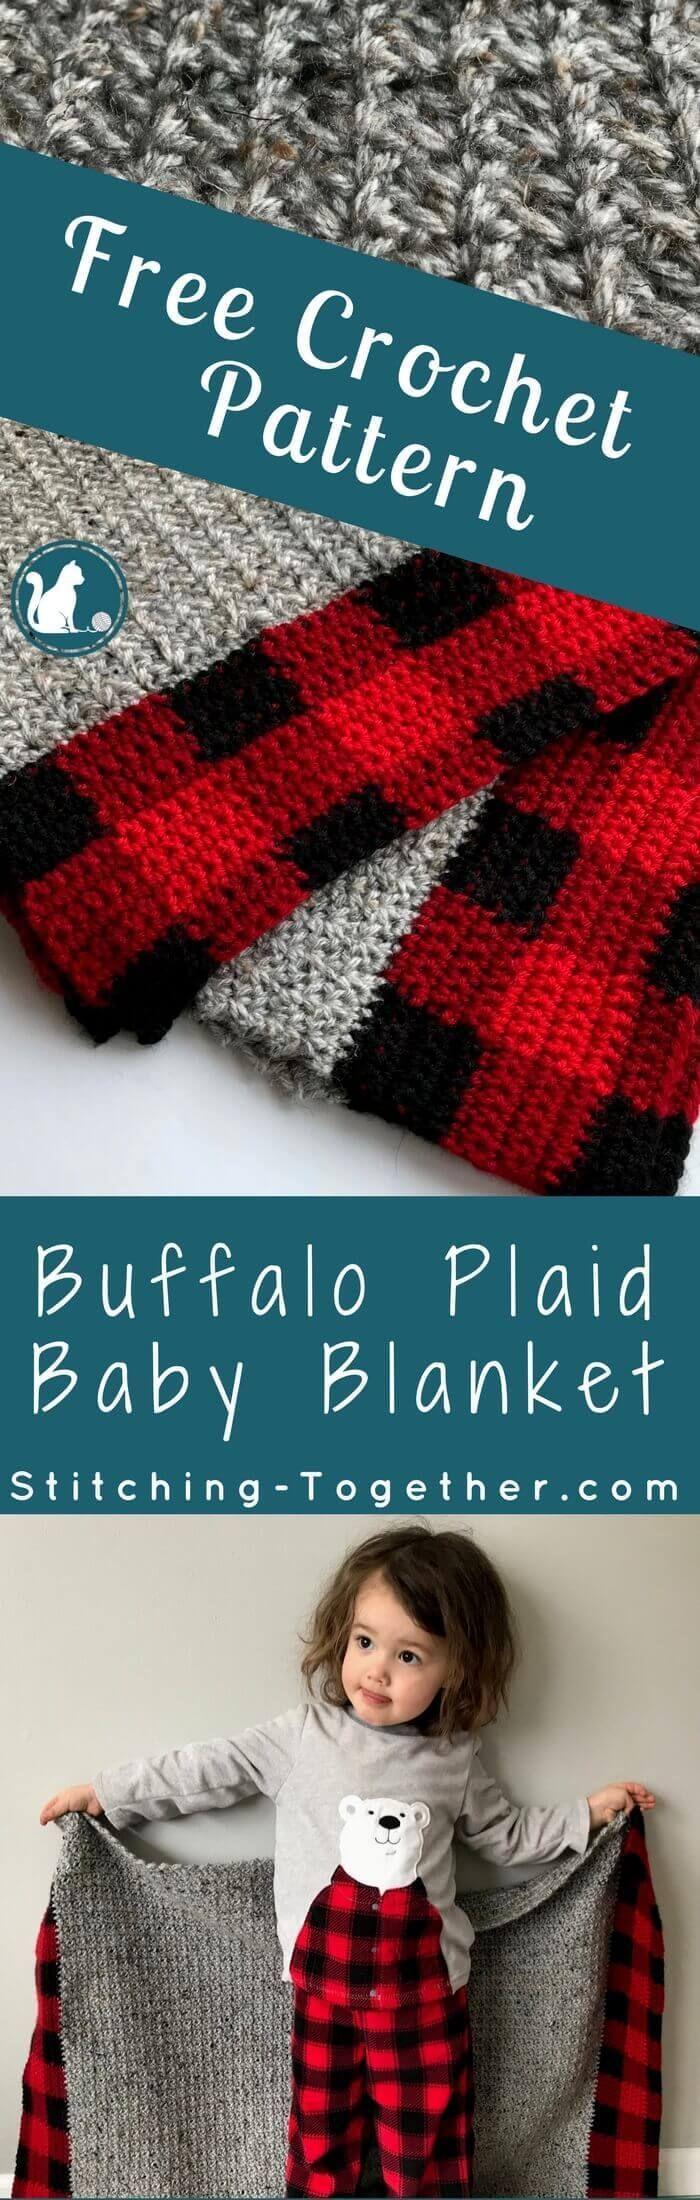 Buffalo Plaid Baby Blanket Free Crochet Pattern Stitching Together Buffalo Plaid Baby Blanket Plaid Crochet Crochet Blanket Diagram